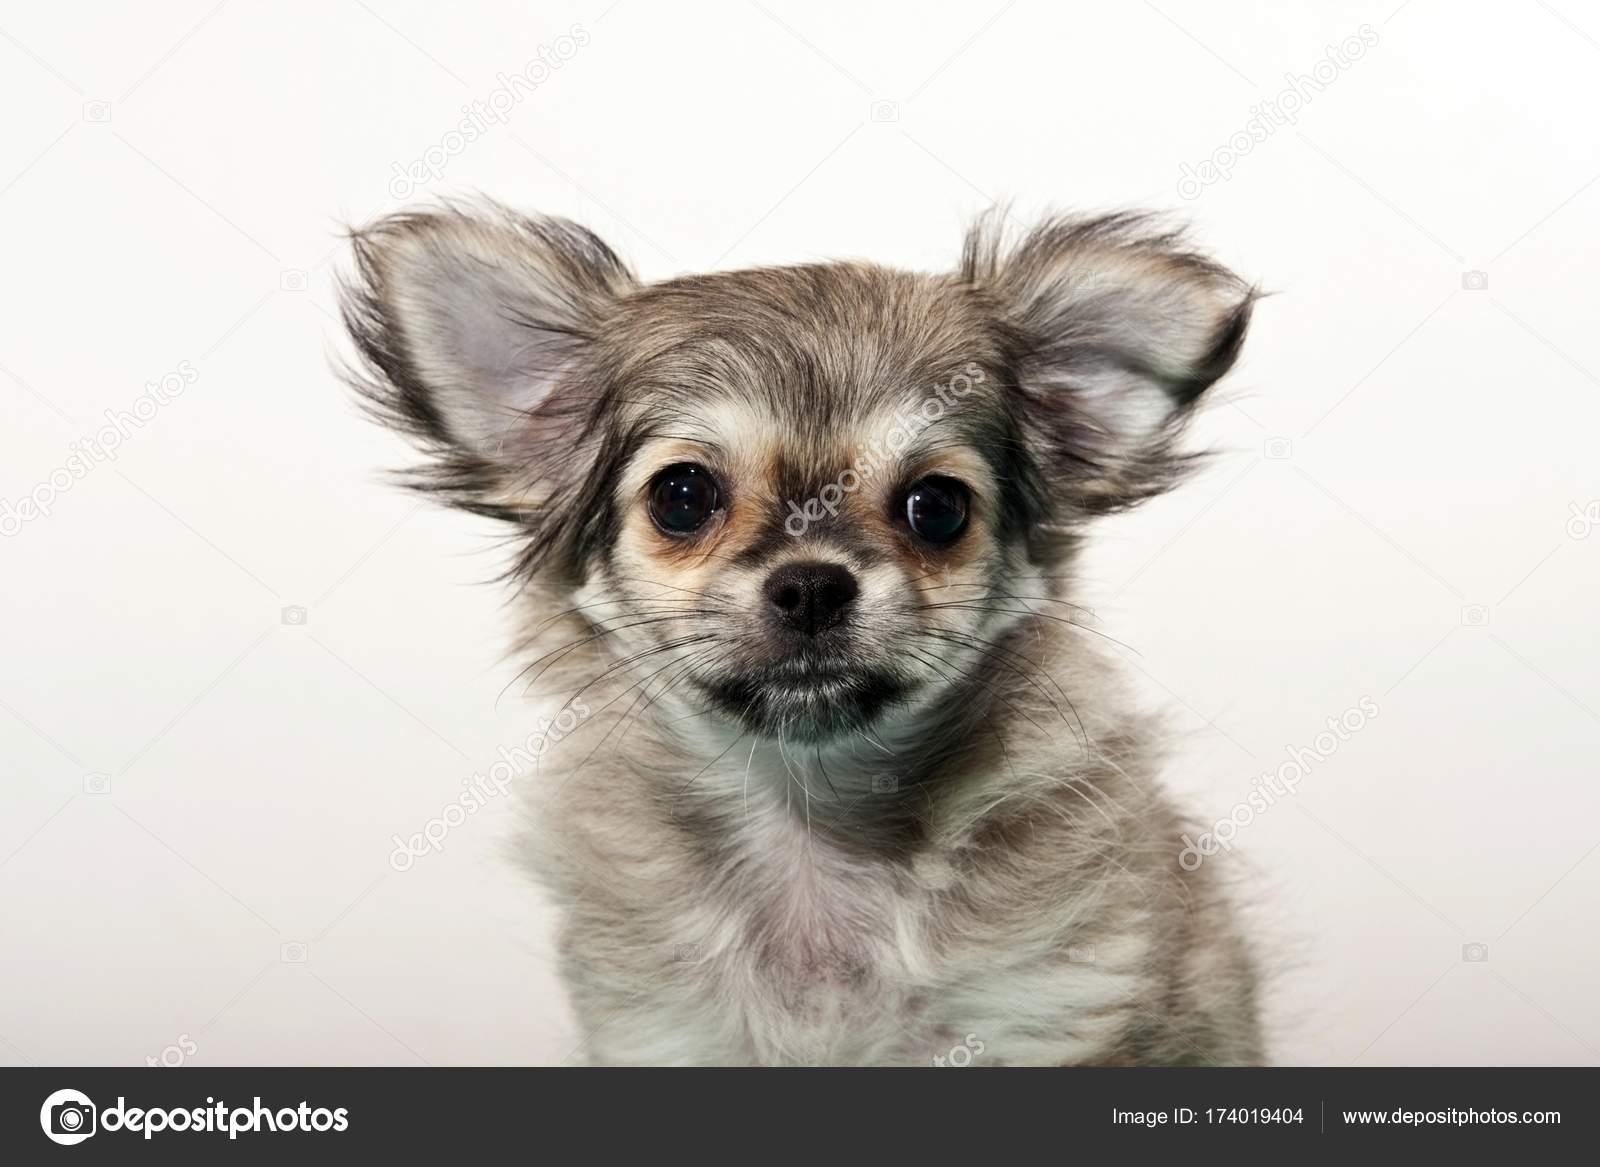 Funny Portrait Cute Little Grey Chihuahua Puppy Stock Photo C Imagebrokermicrostock 174019404